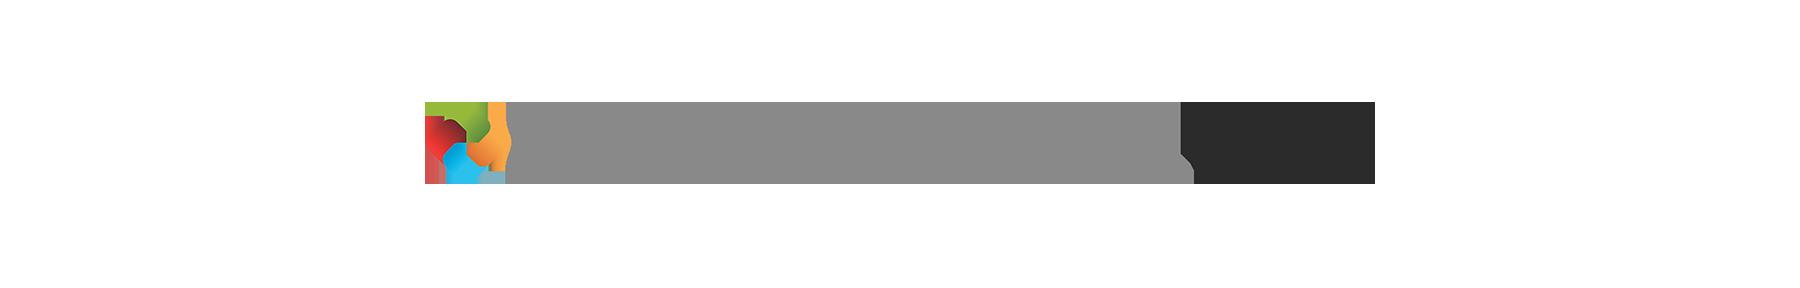 commercial-hub-logo